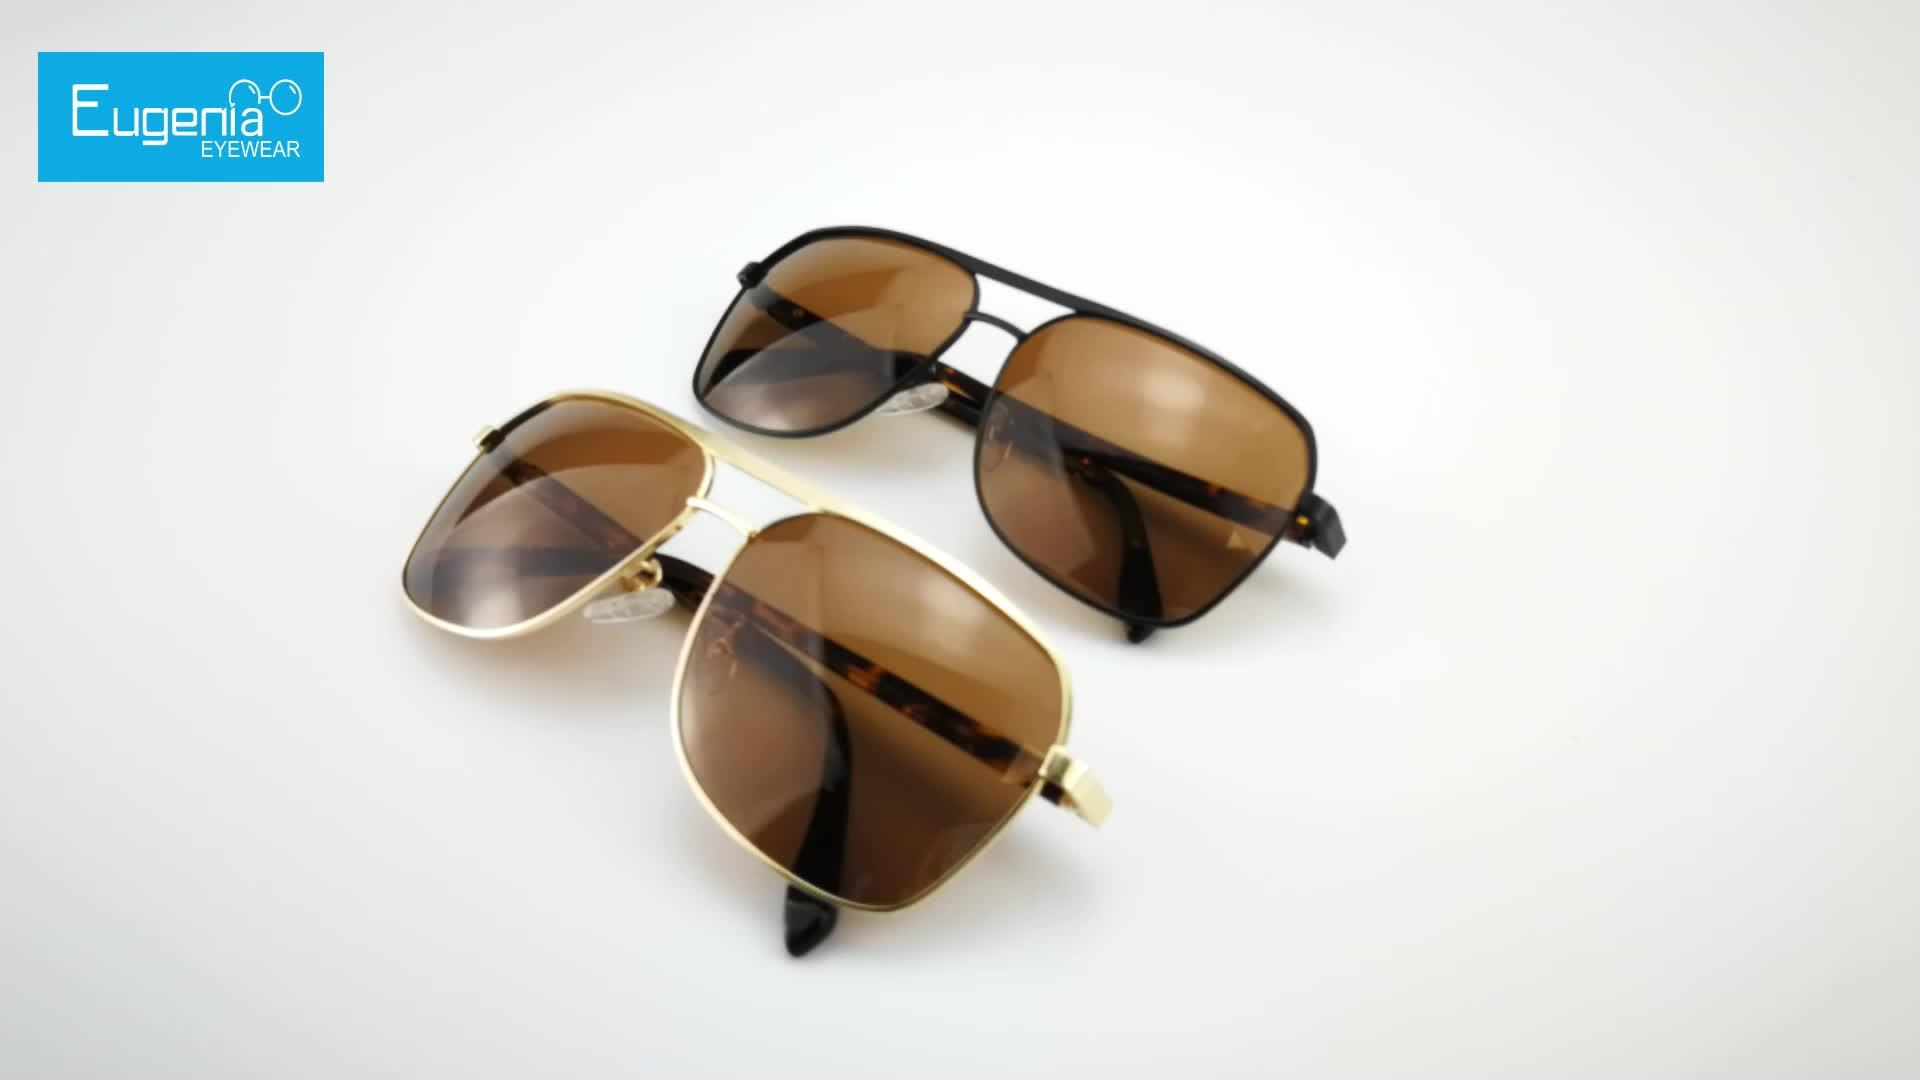 EUGENIA Sunglasses men 2020 new style topsales metal frame custom design acceptable sunglasses